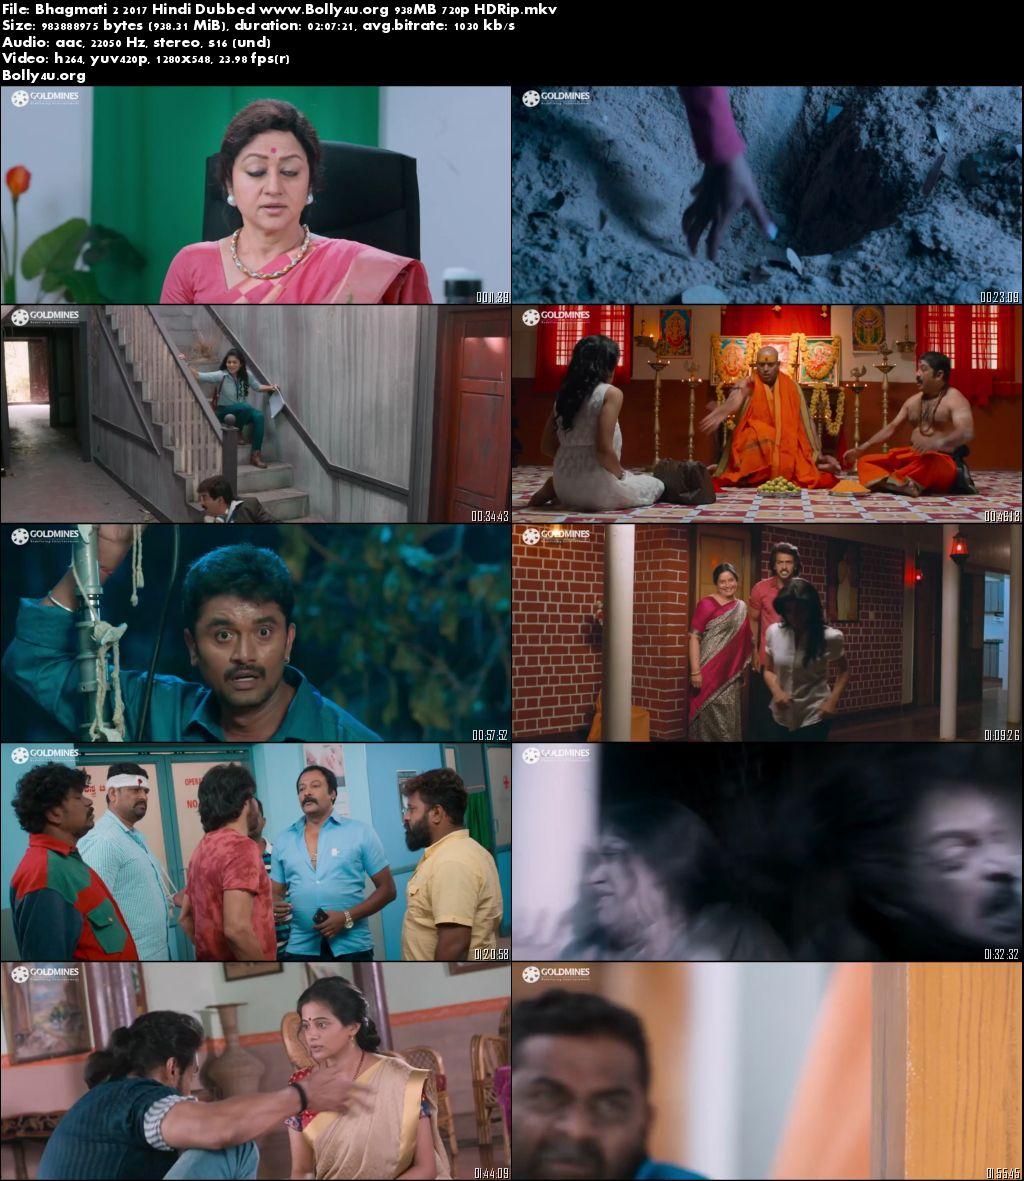 Bhagmati 2 2017 HDRip 720p Hindi Dubbed 900MB Download